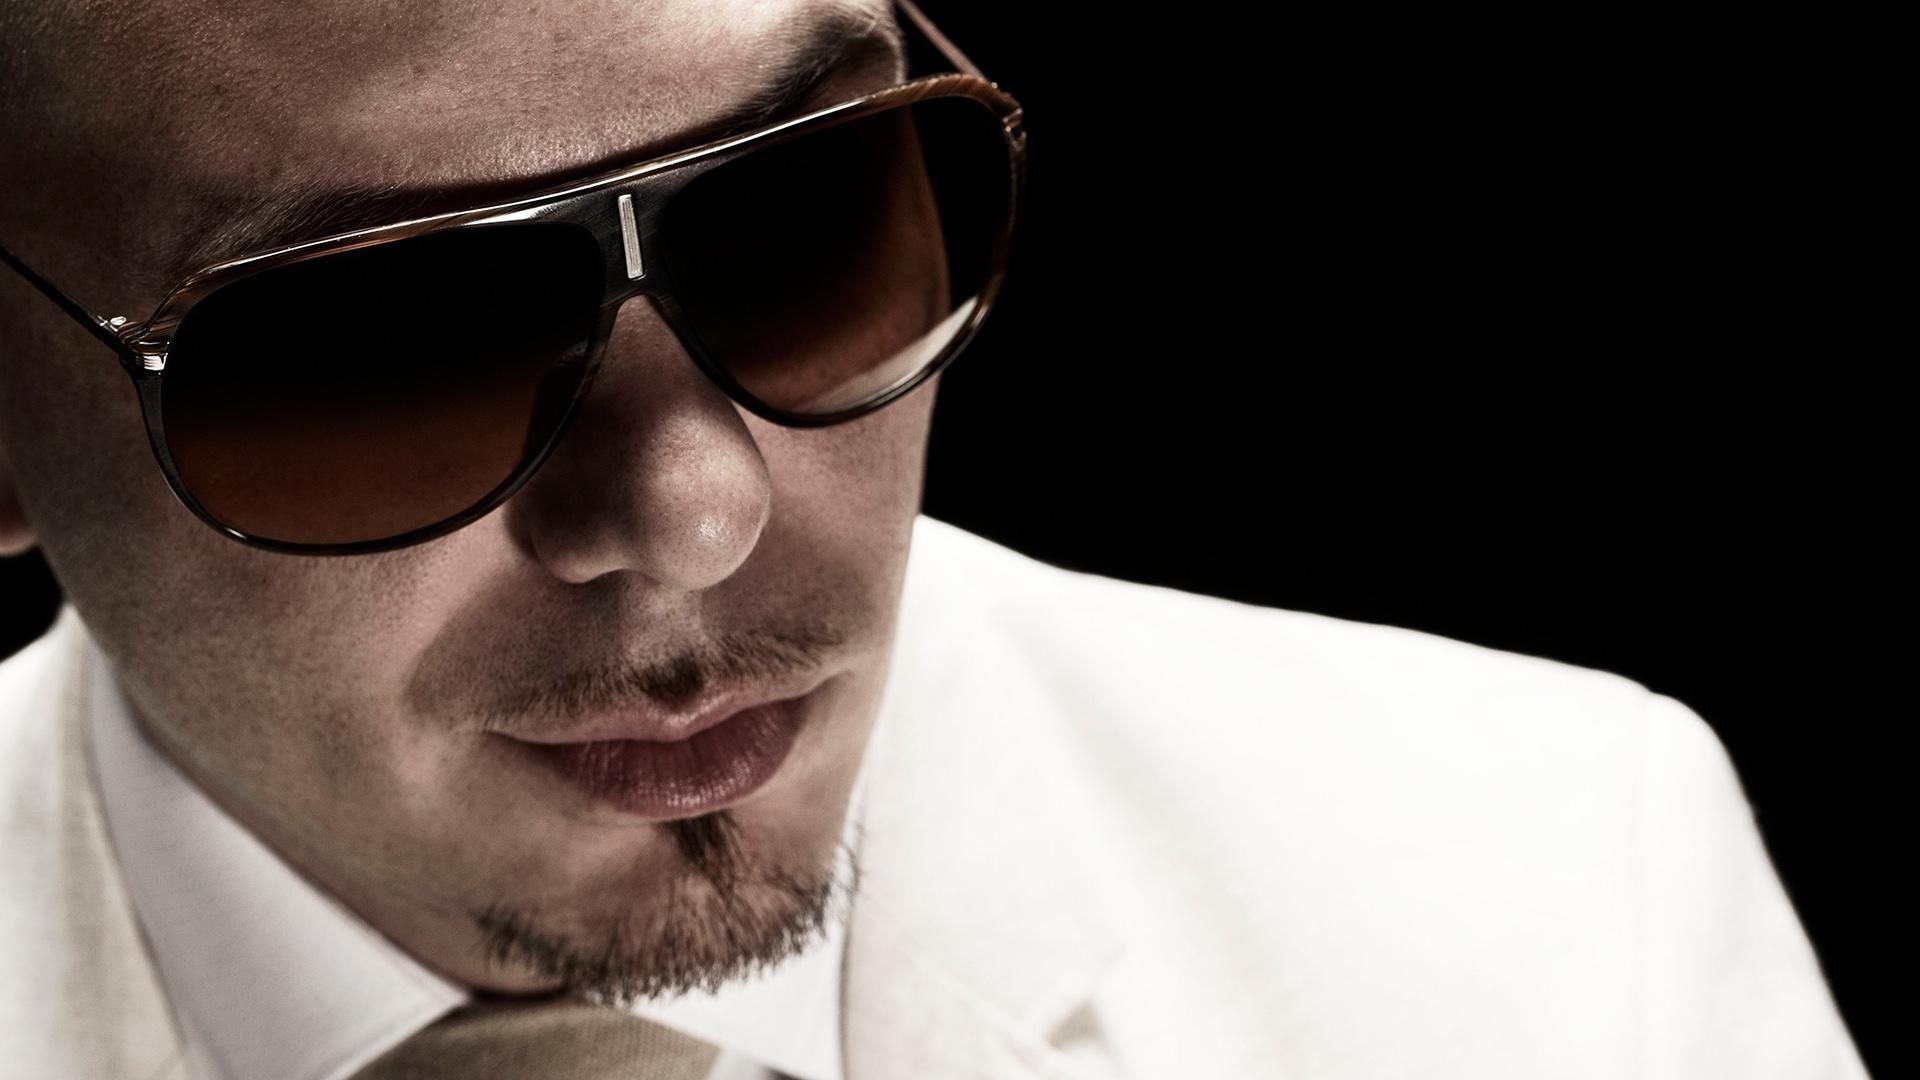 Wallpaper : sunglasses, glasses, Gentleman, moustache, cool